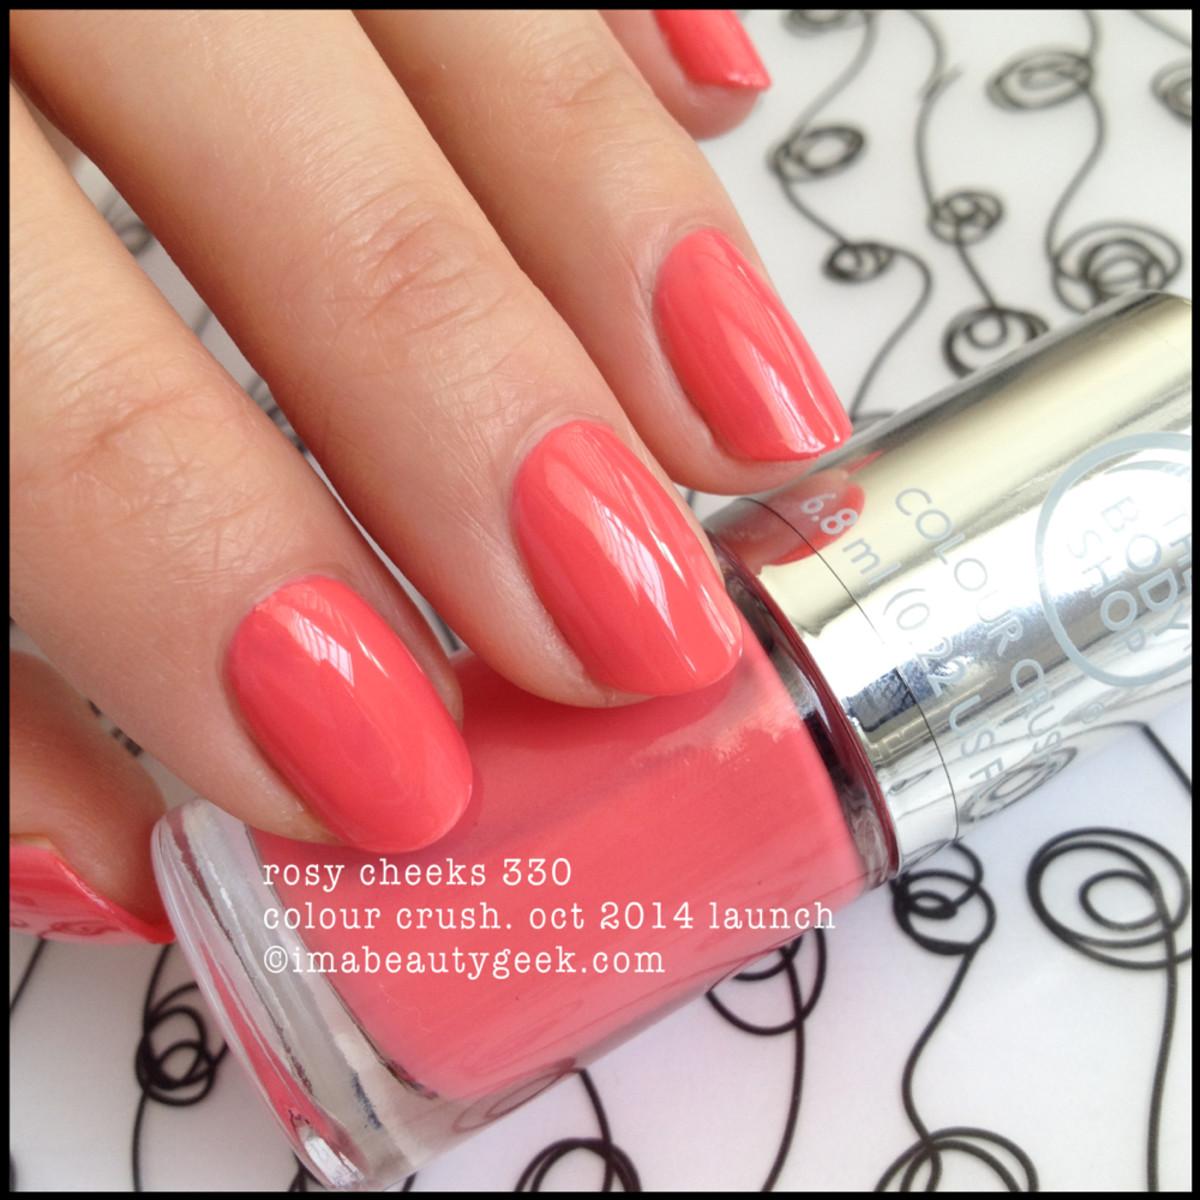 Body Shop Rosy Cheeks 330 Colour Crush Polish